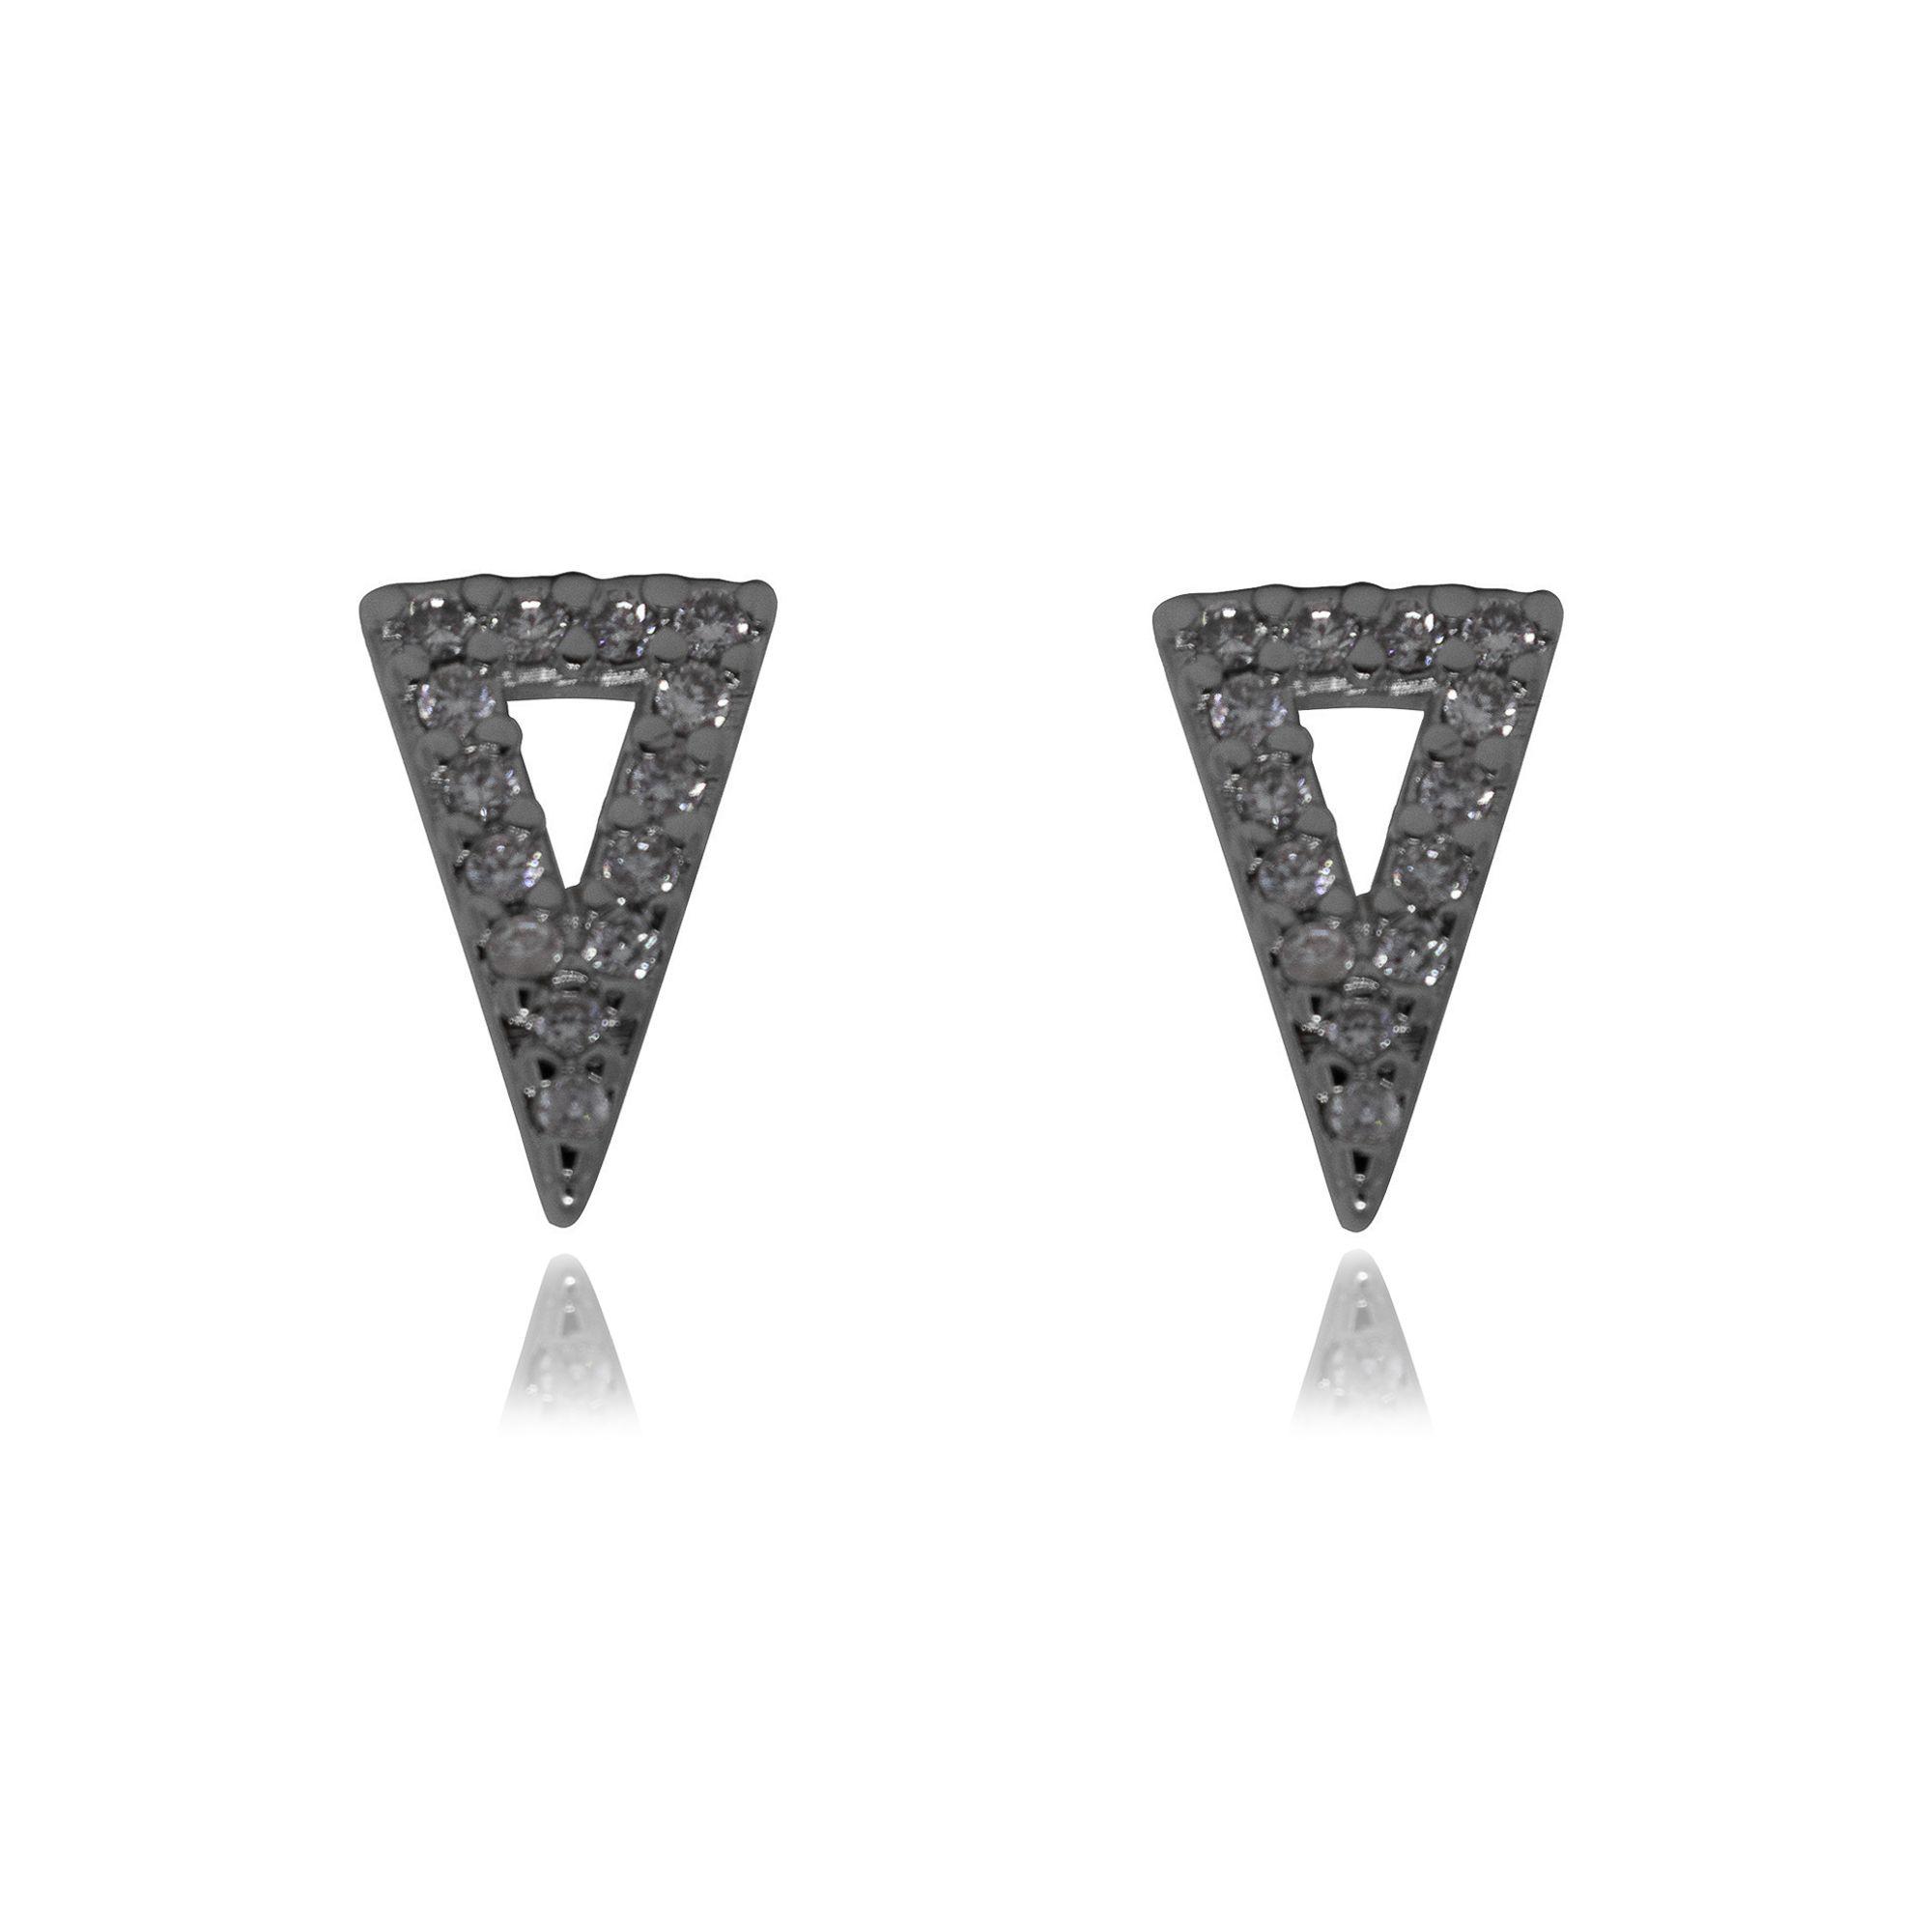 Brinco Semi joia triangular folheado a ouro 18k ou rhodium mini